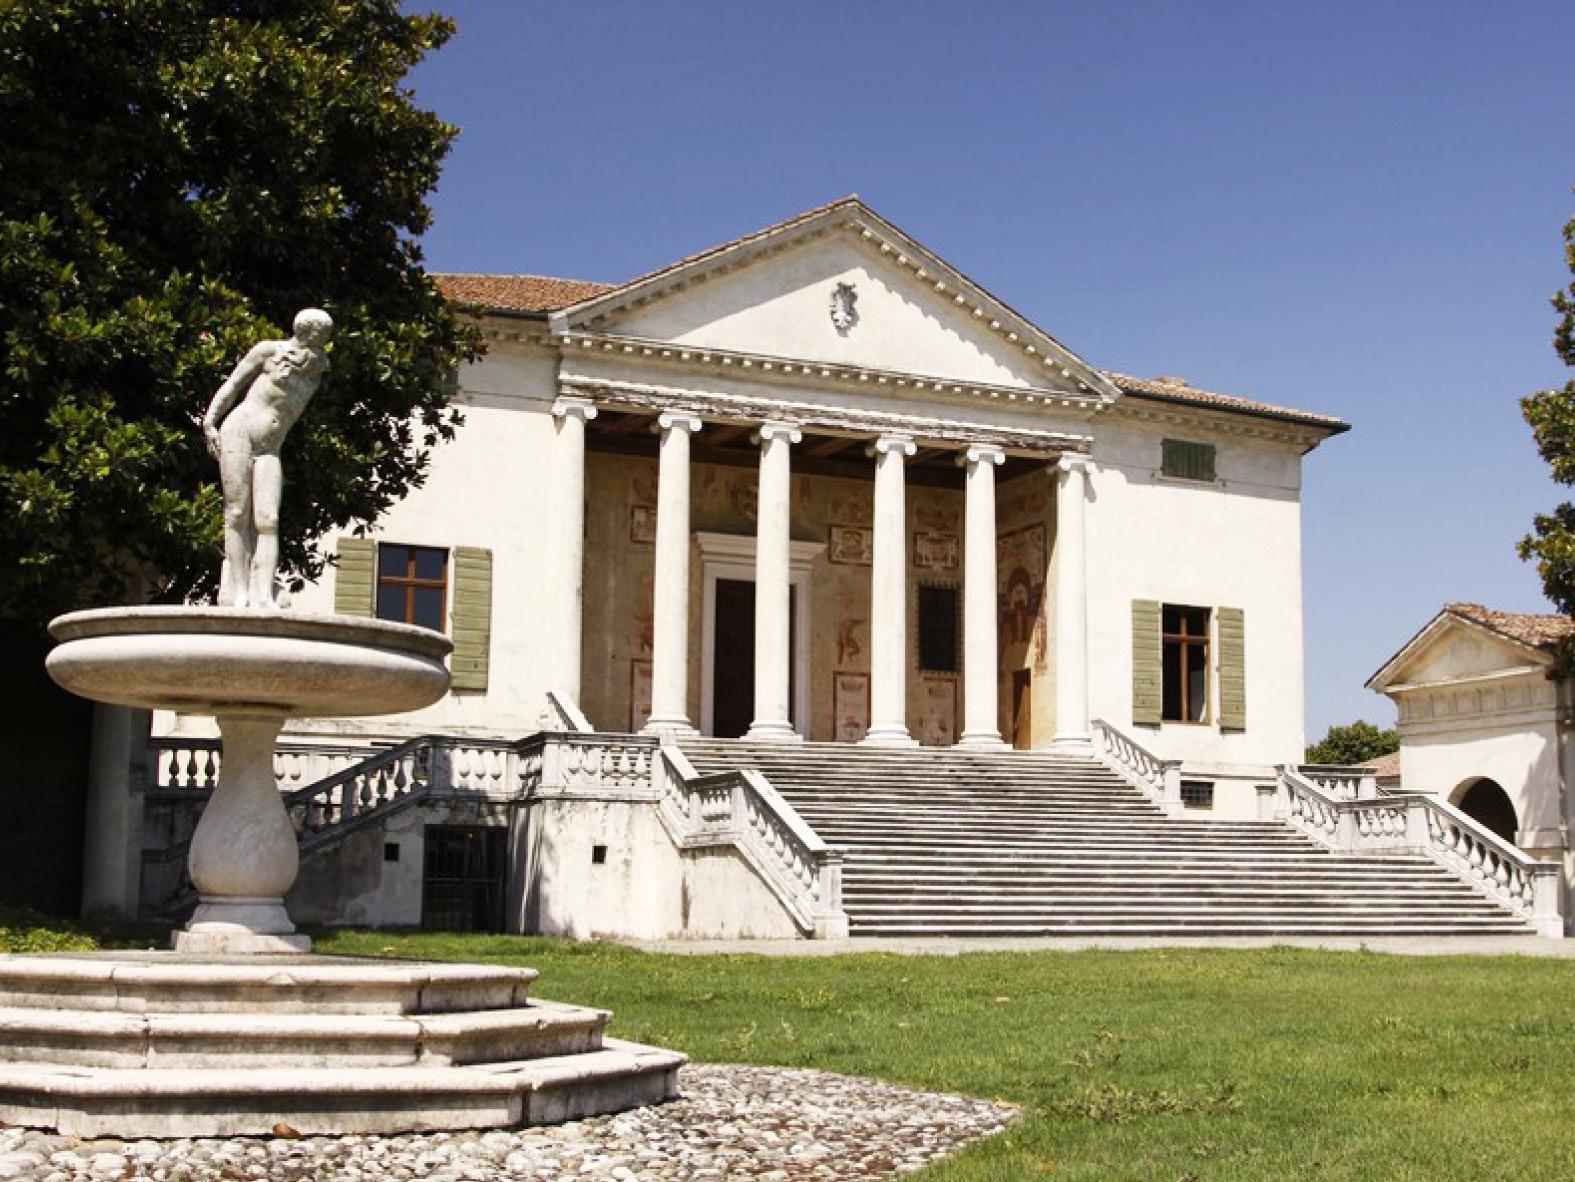 Villa Badoer in Fratta Polesine